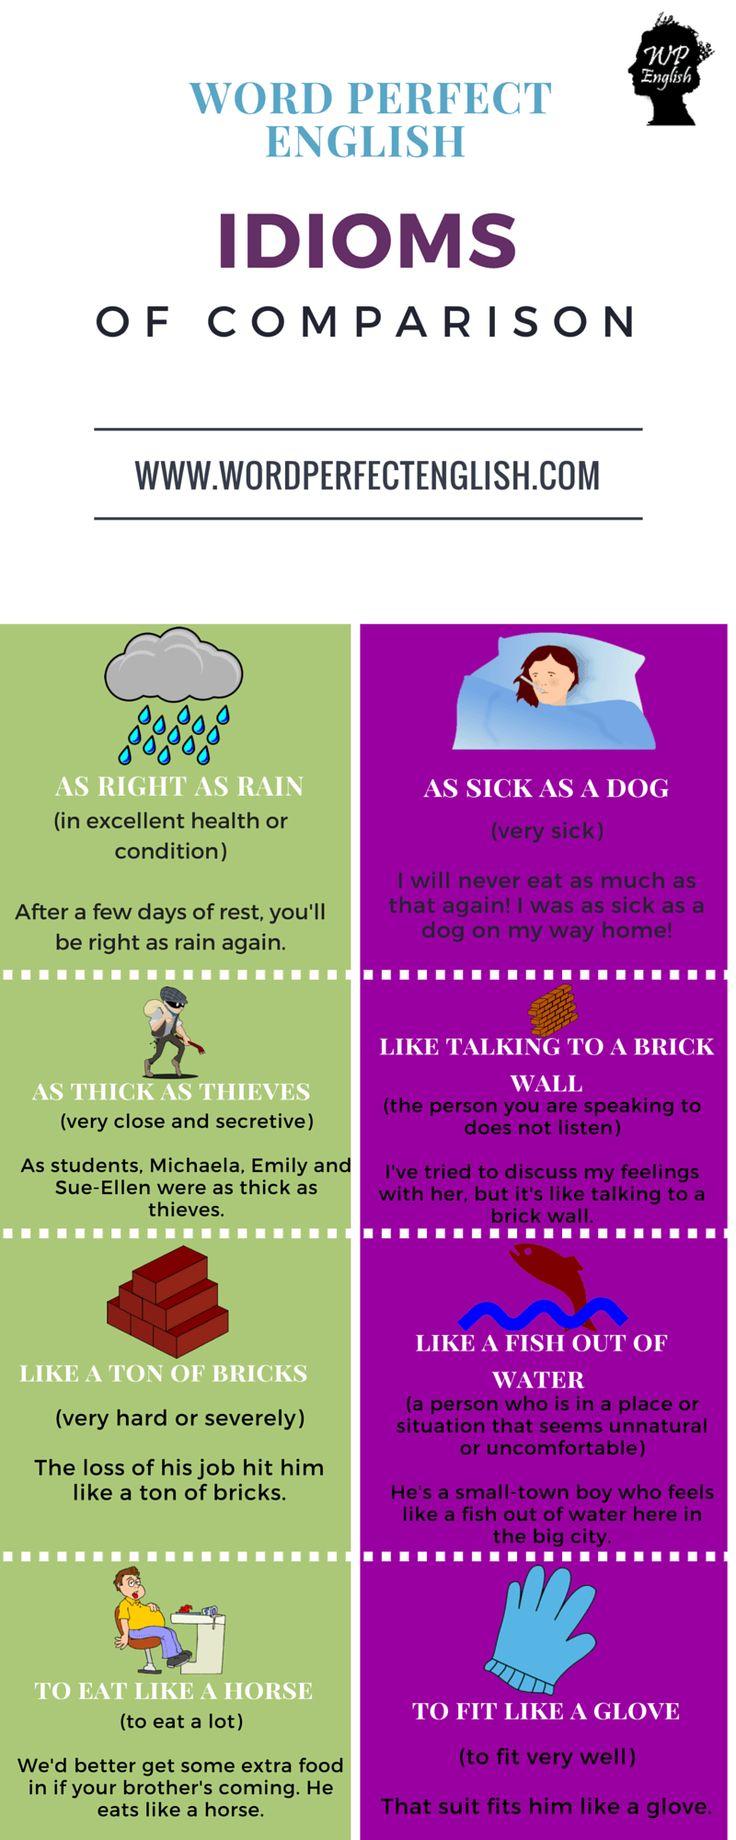 Compare & Describe in English Using Idioms! - Word Perfect English